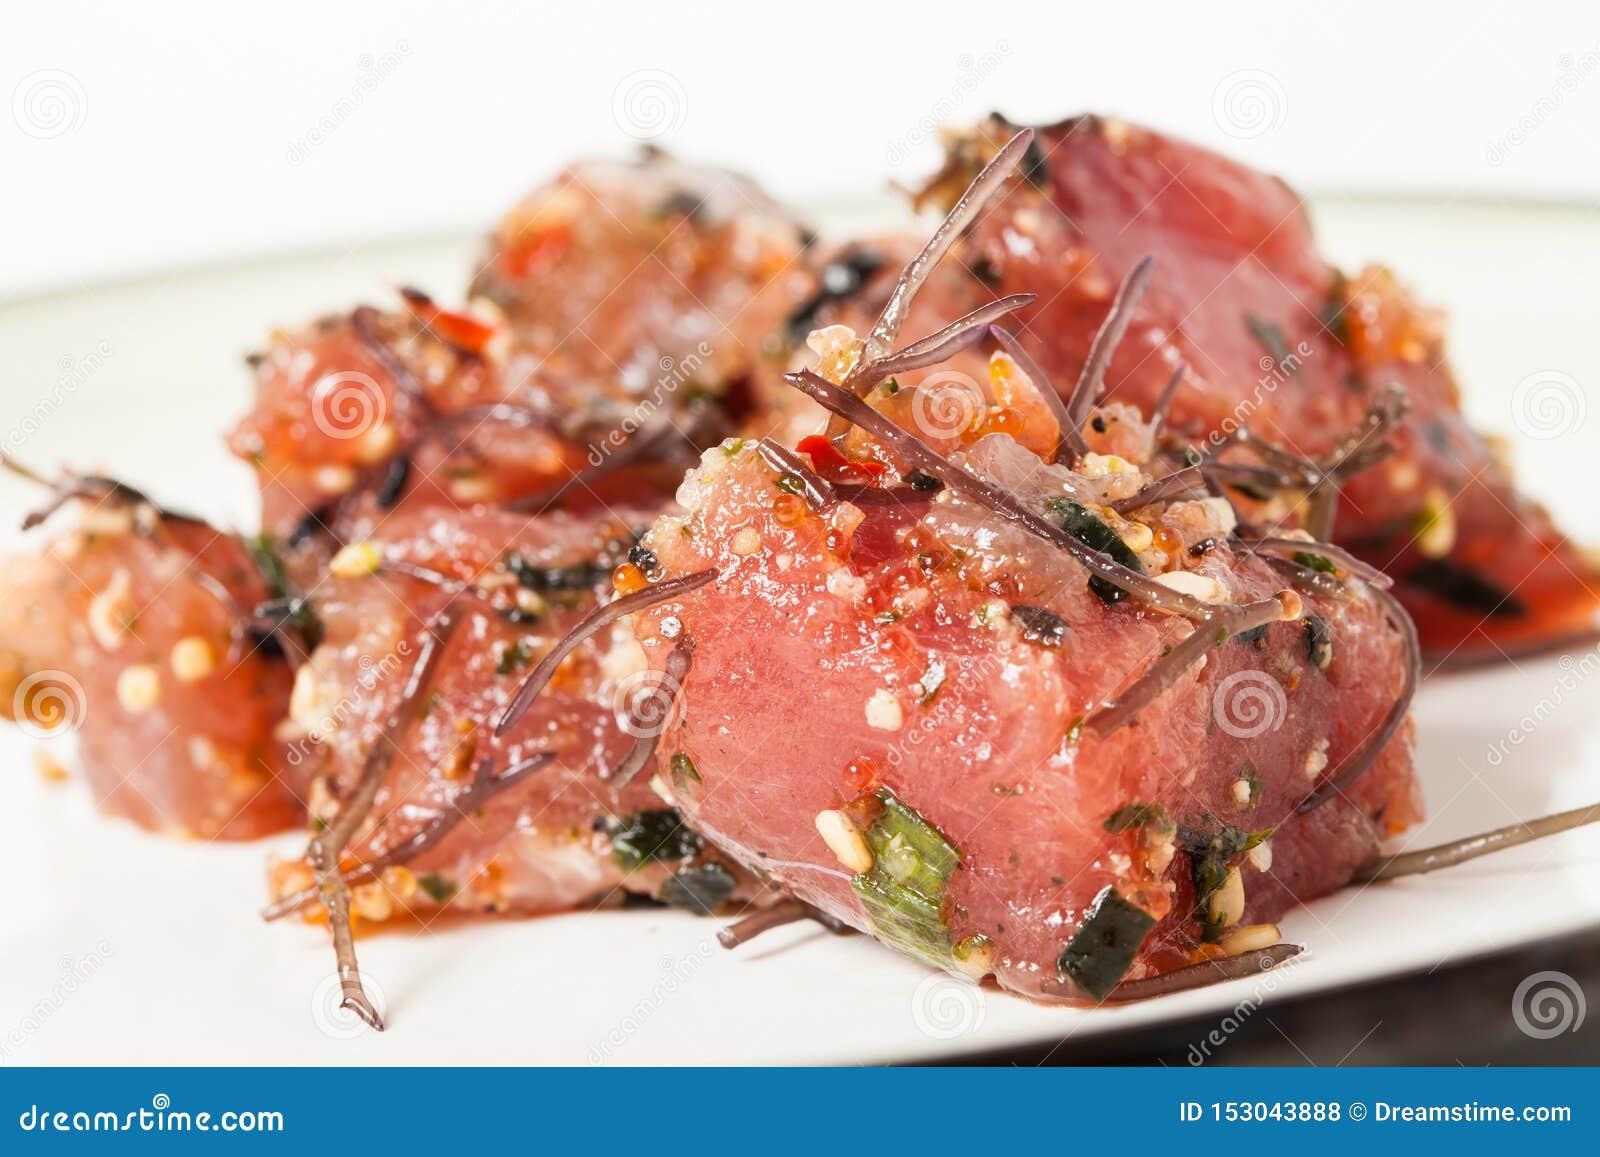 Delicious Hawaiian Poke Raw Fish Prepared with Onions and Seaweed